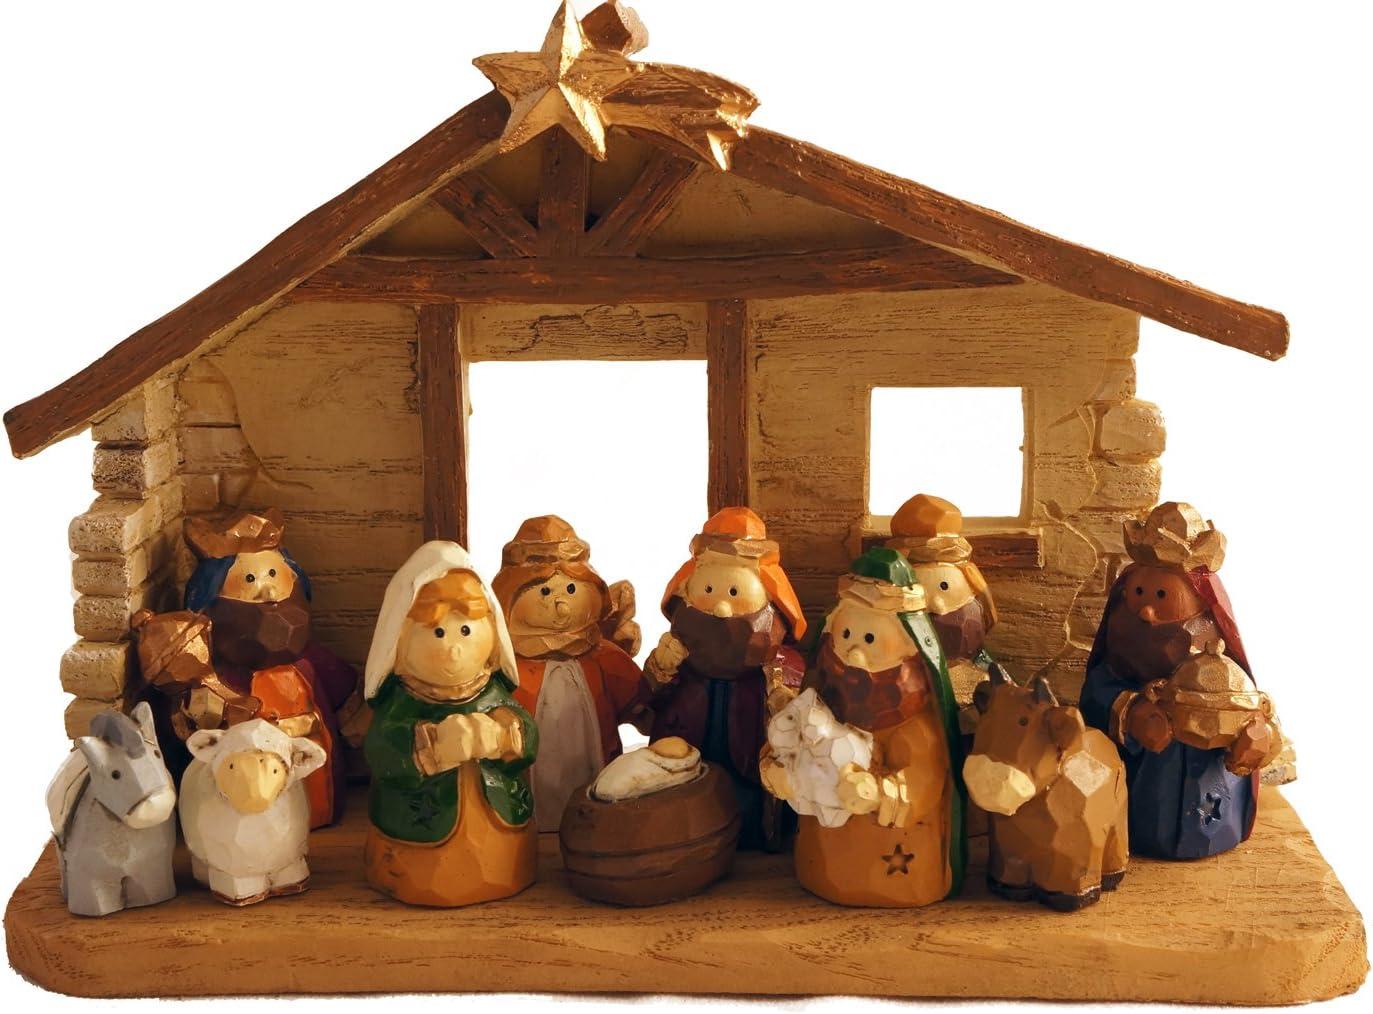 Amazon Com Miniature Kids Christmas Nativity Scene With Creche Set Of 12 Rearrangeable Figures Home Kitchen